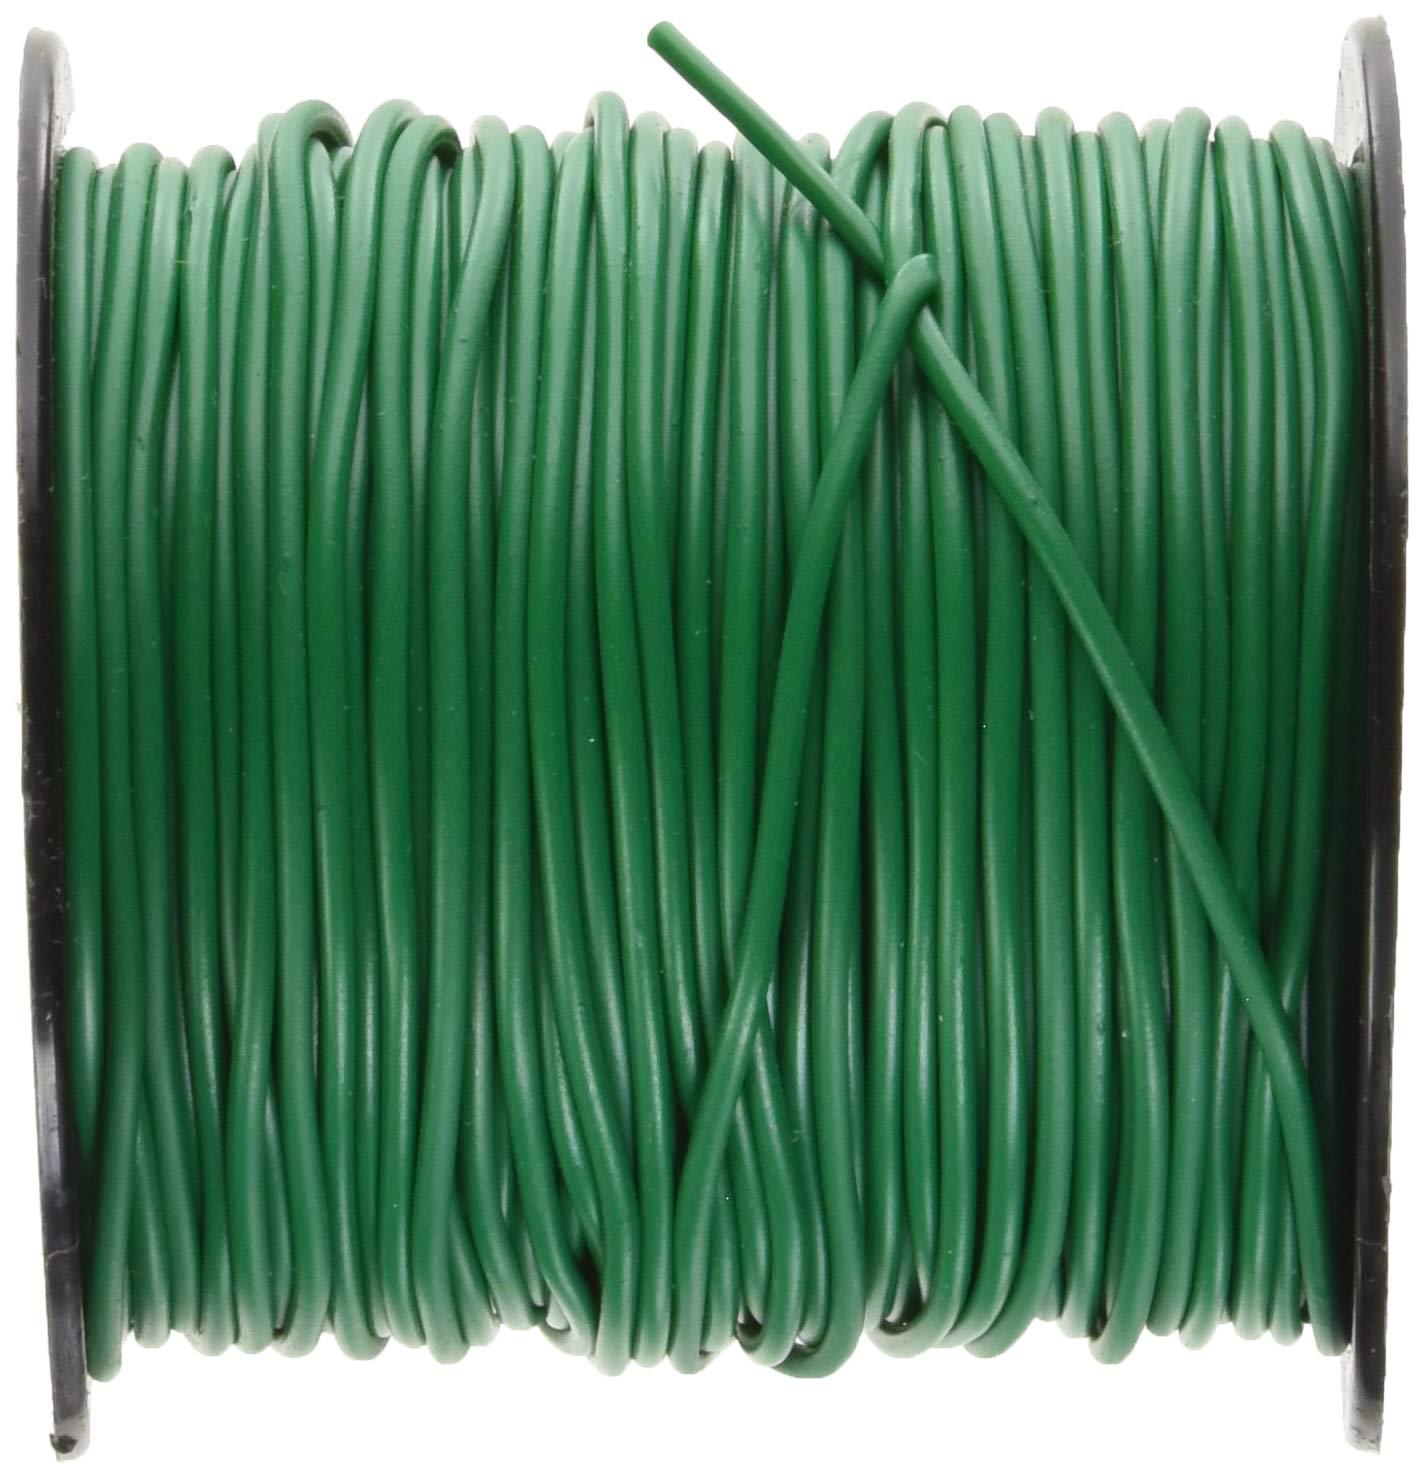 50-Yard Spool Pepperell SG50-01 Sgetti String Plastic Craft Lace White